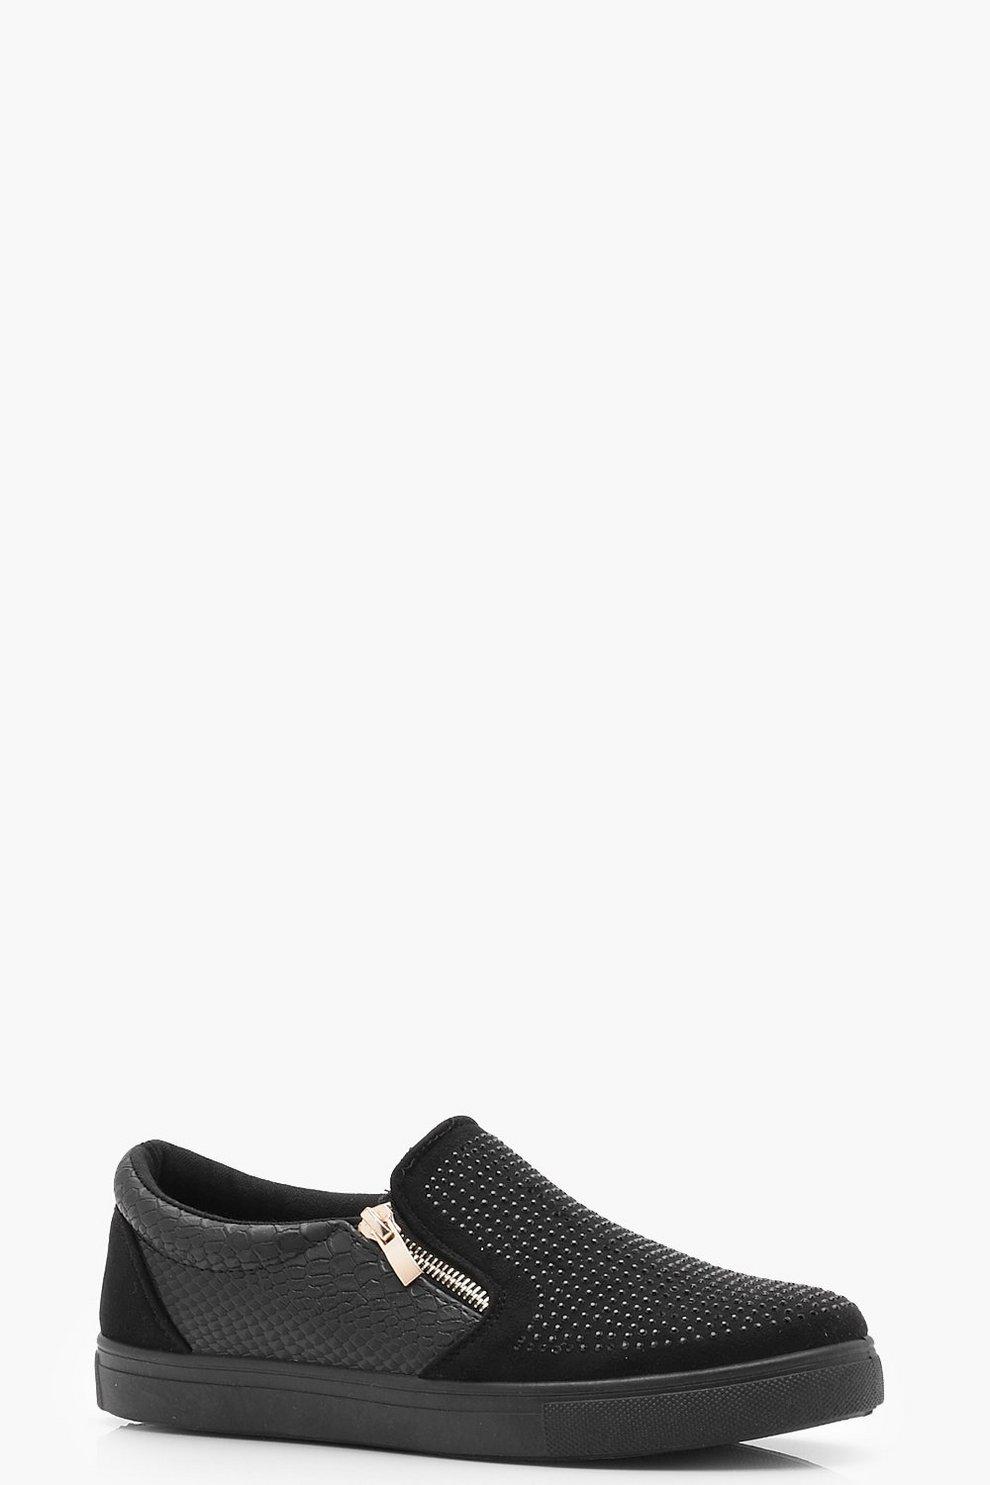 Diamante scarpe Skater con cerniera boohoo neri Floreale NMlFXRmmu